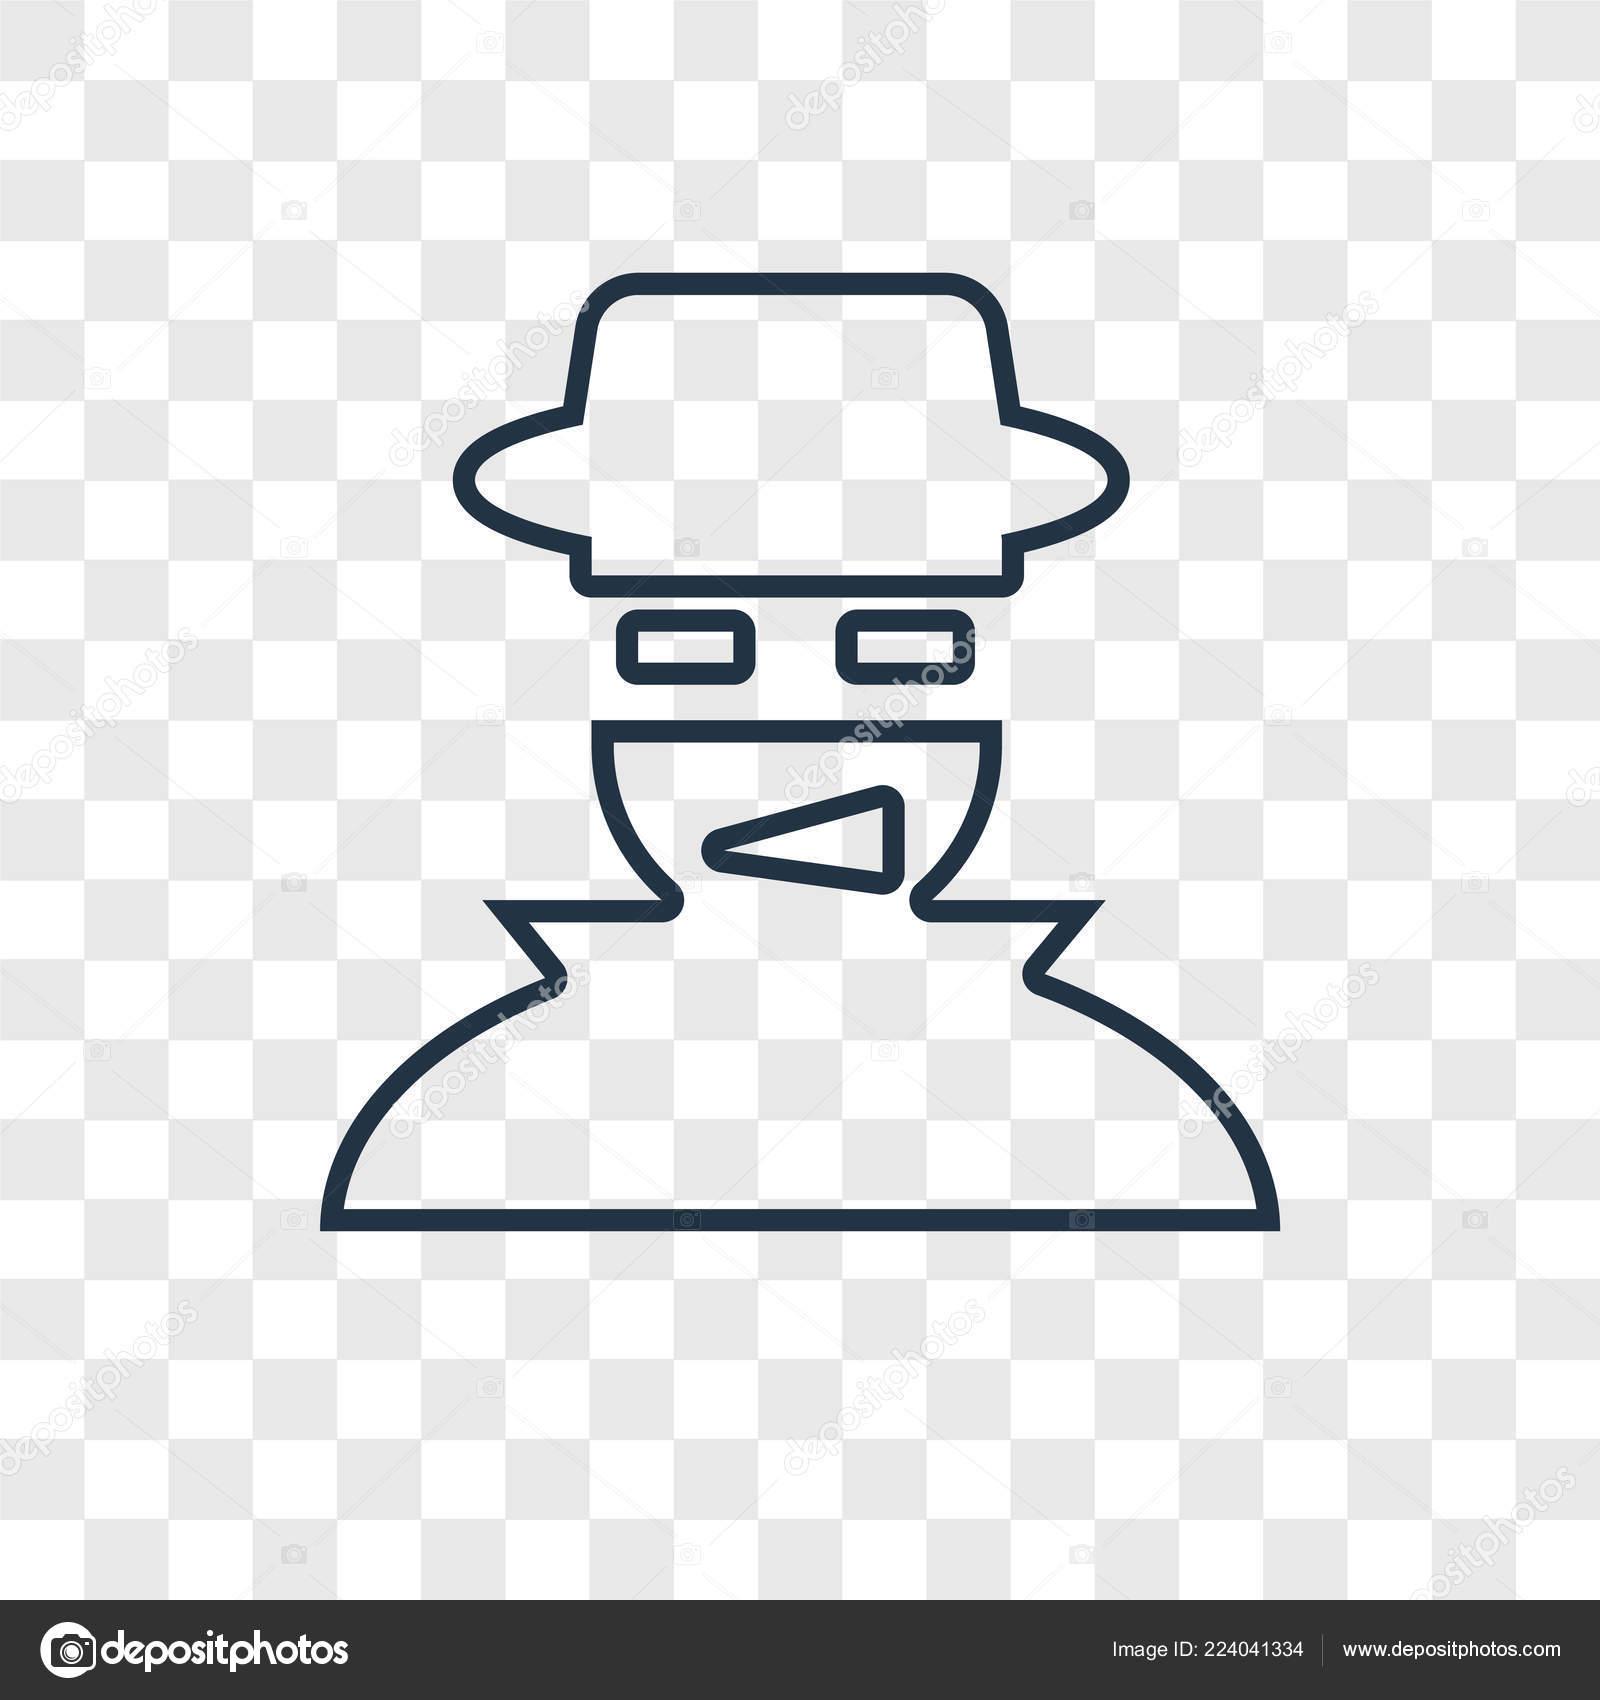 Hacker Icon Trendy Design Style Hacker Icon Isolated Transparent Background Stock Vector C Topvectorstock 224041334